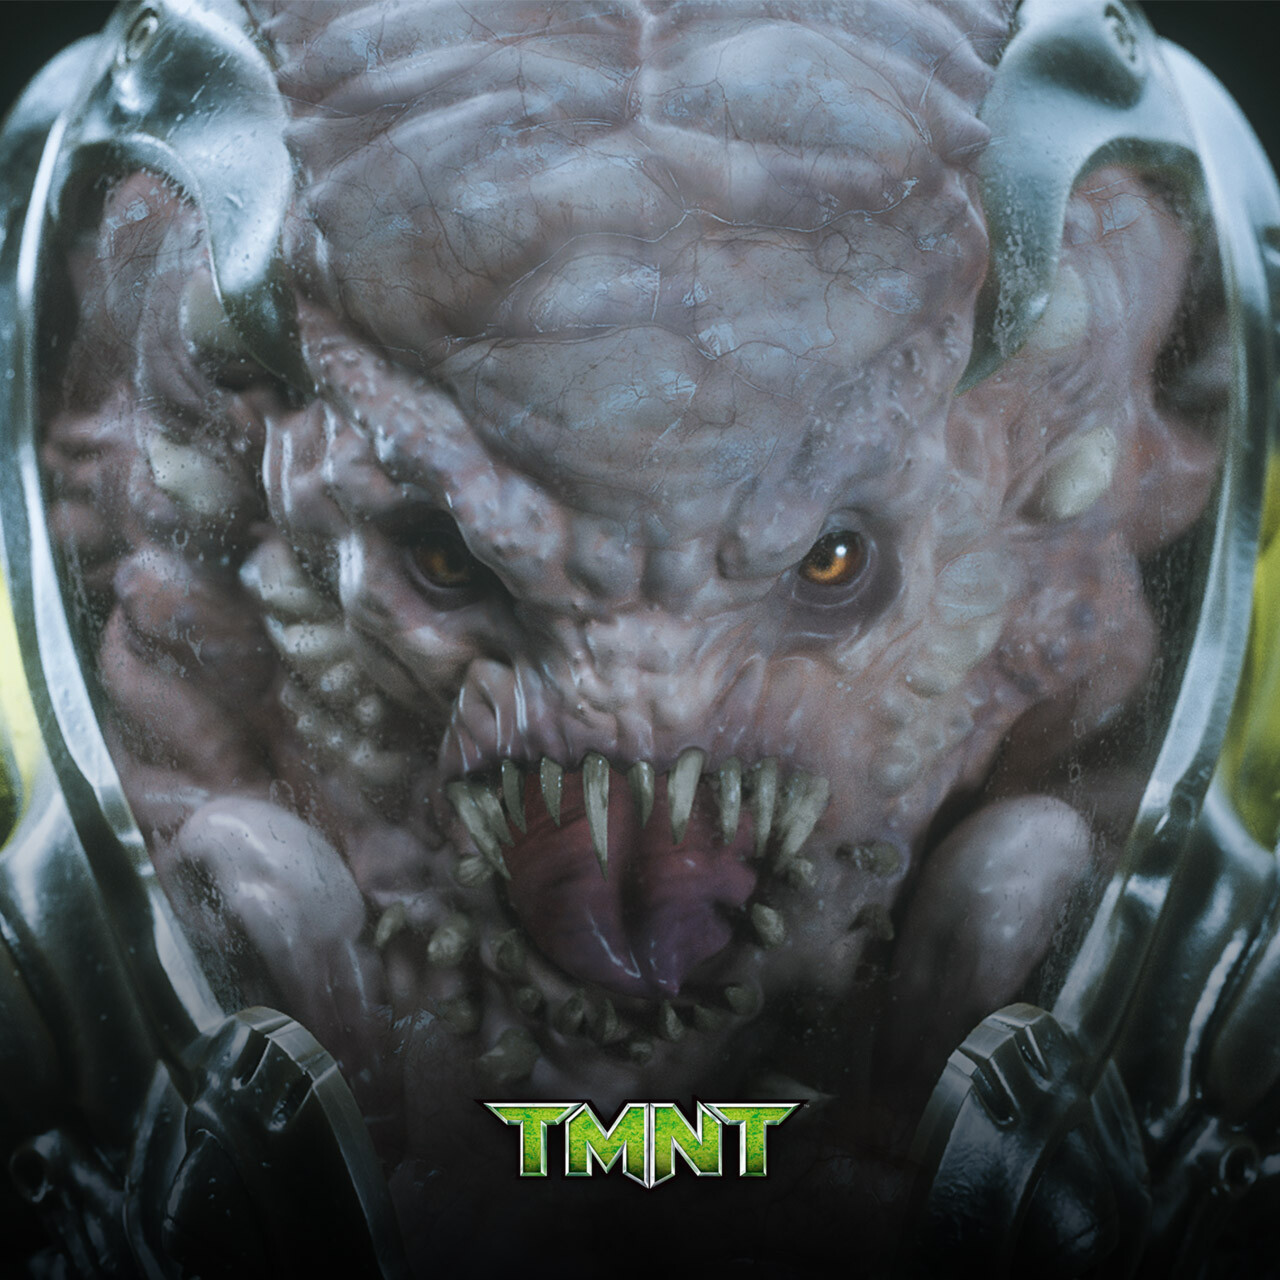 Krang - TMNT Redesign